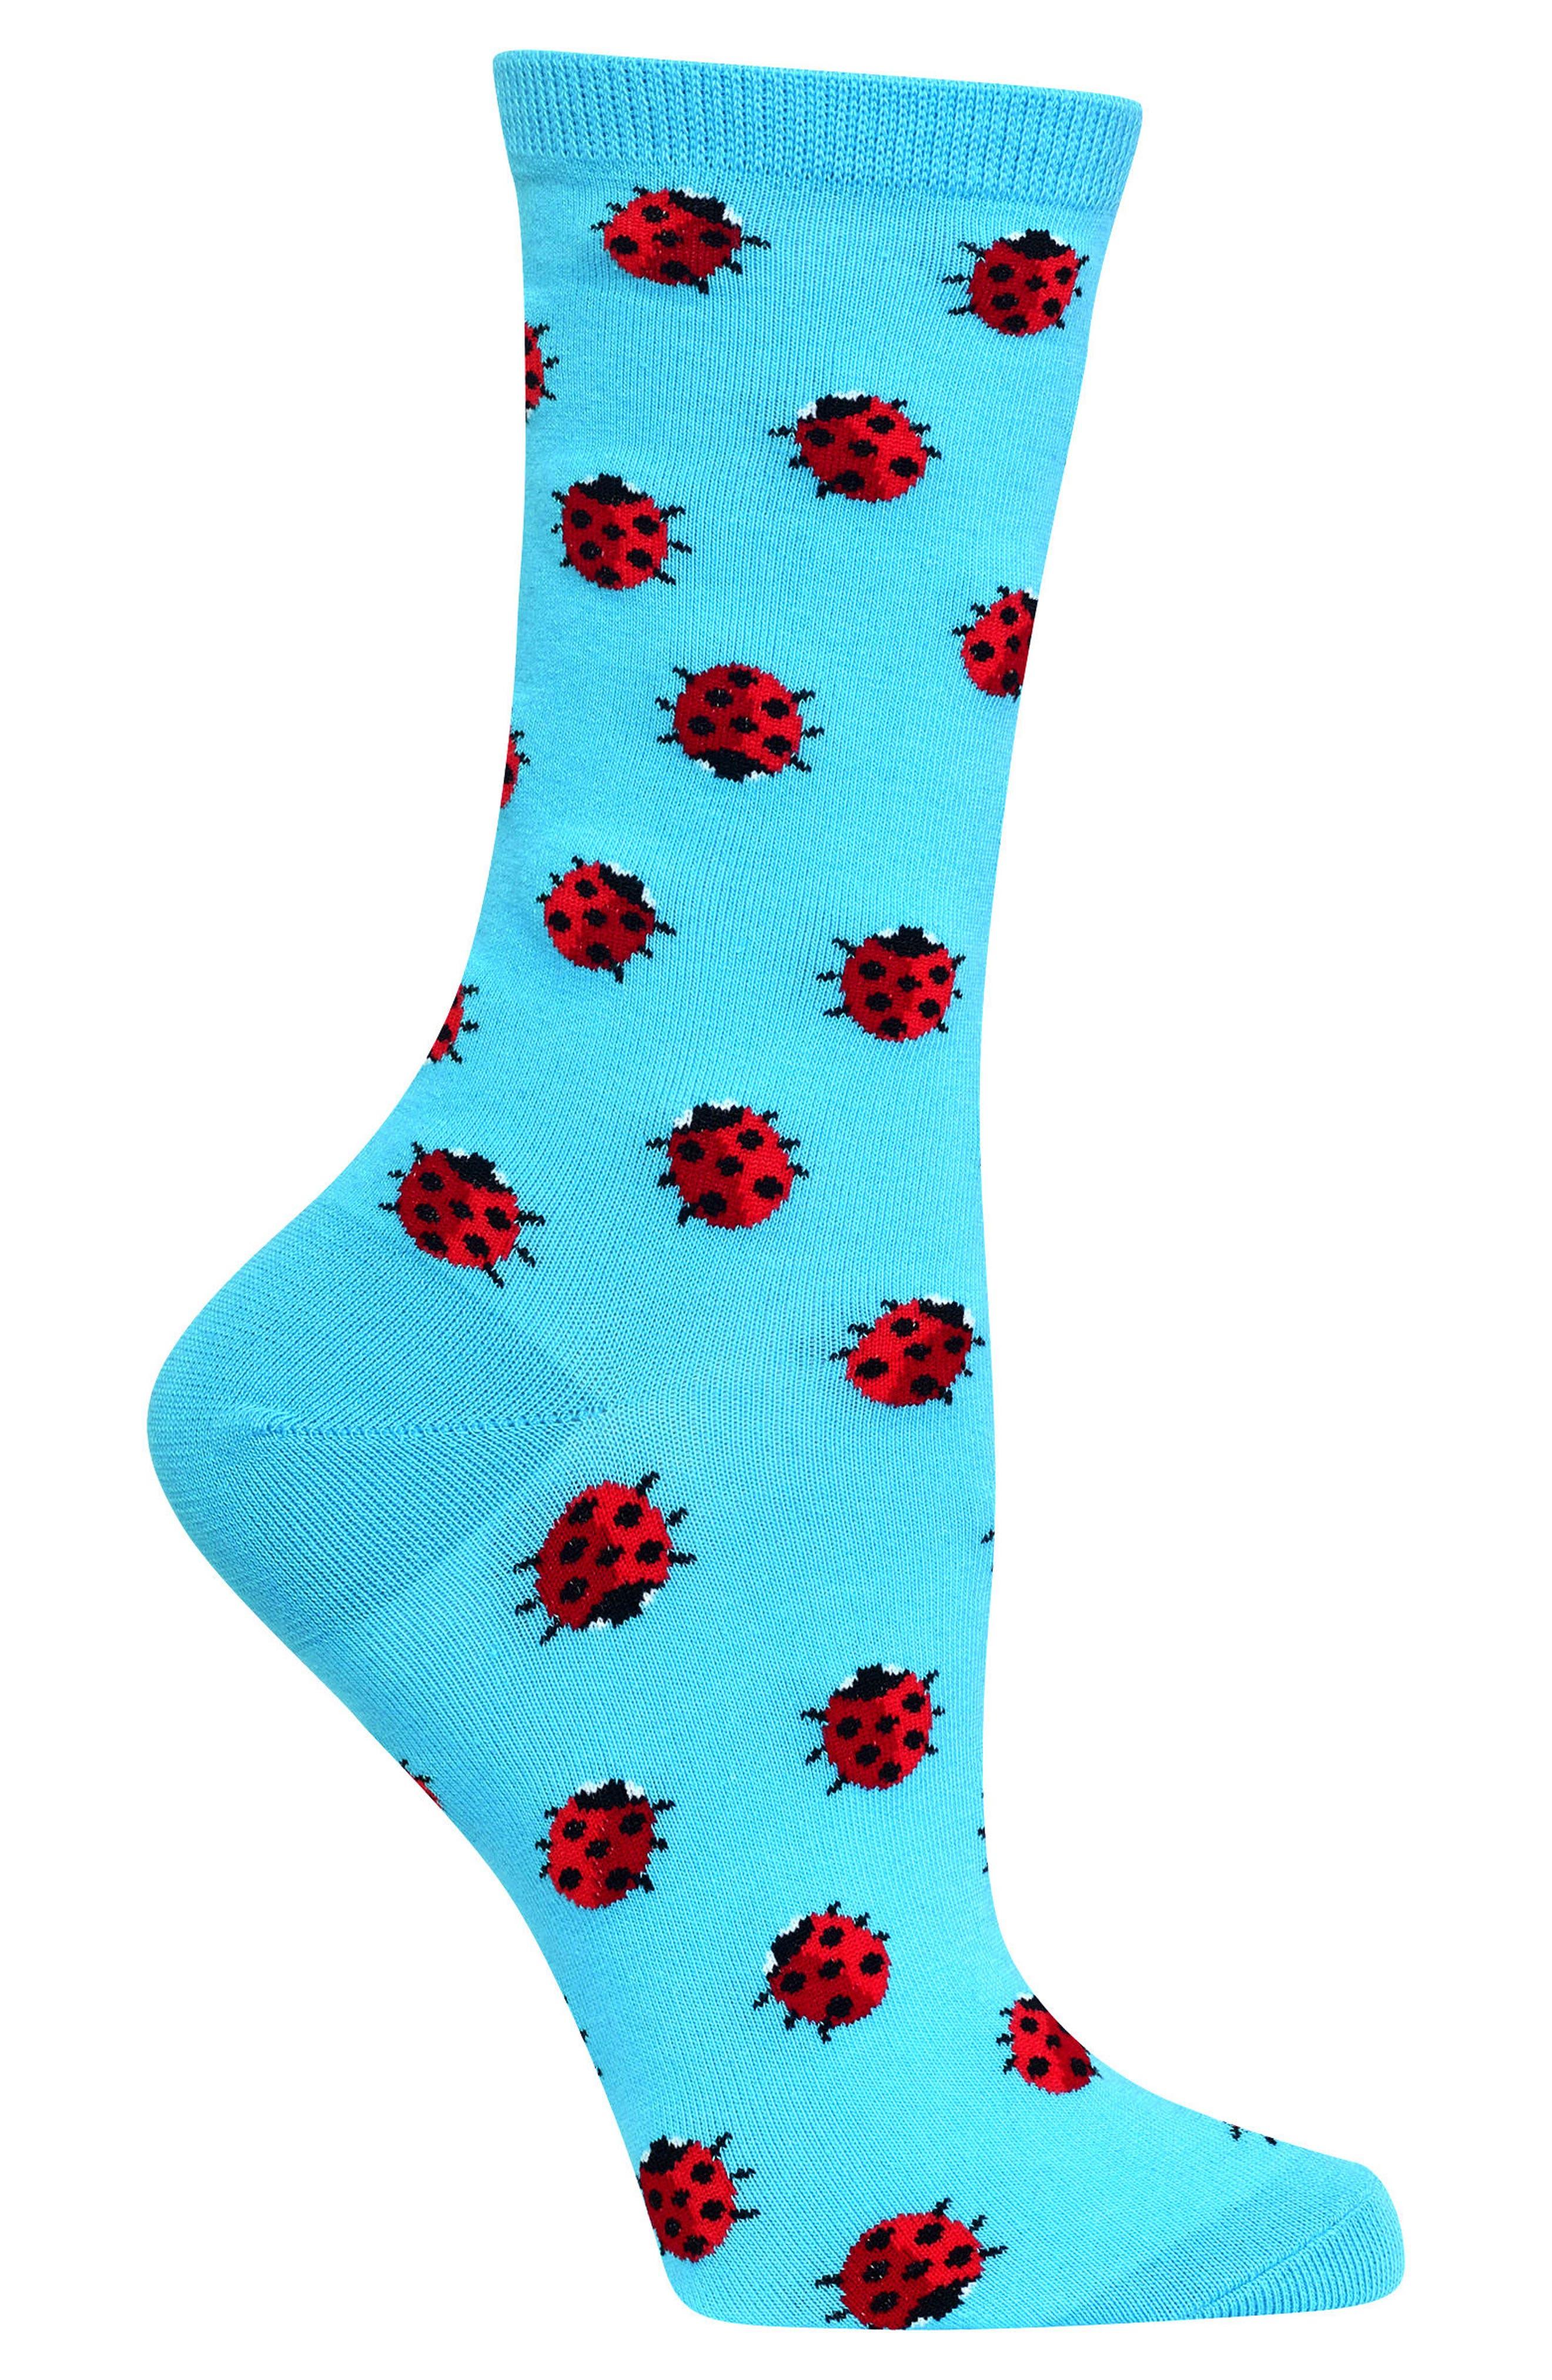 Ladybug Crew Socks,                             Alternate thumbnail 3, color,                             Light Blue